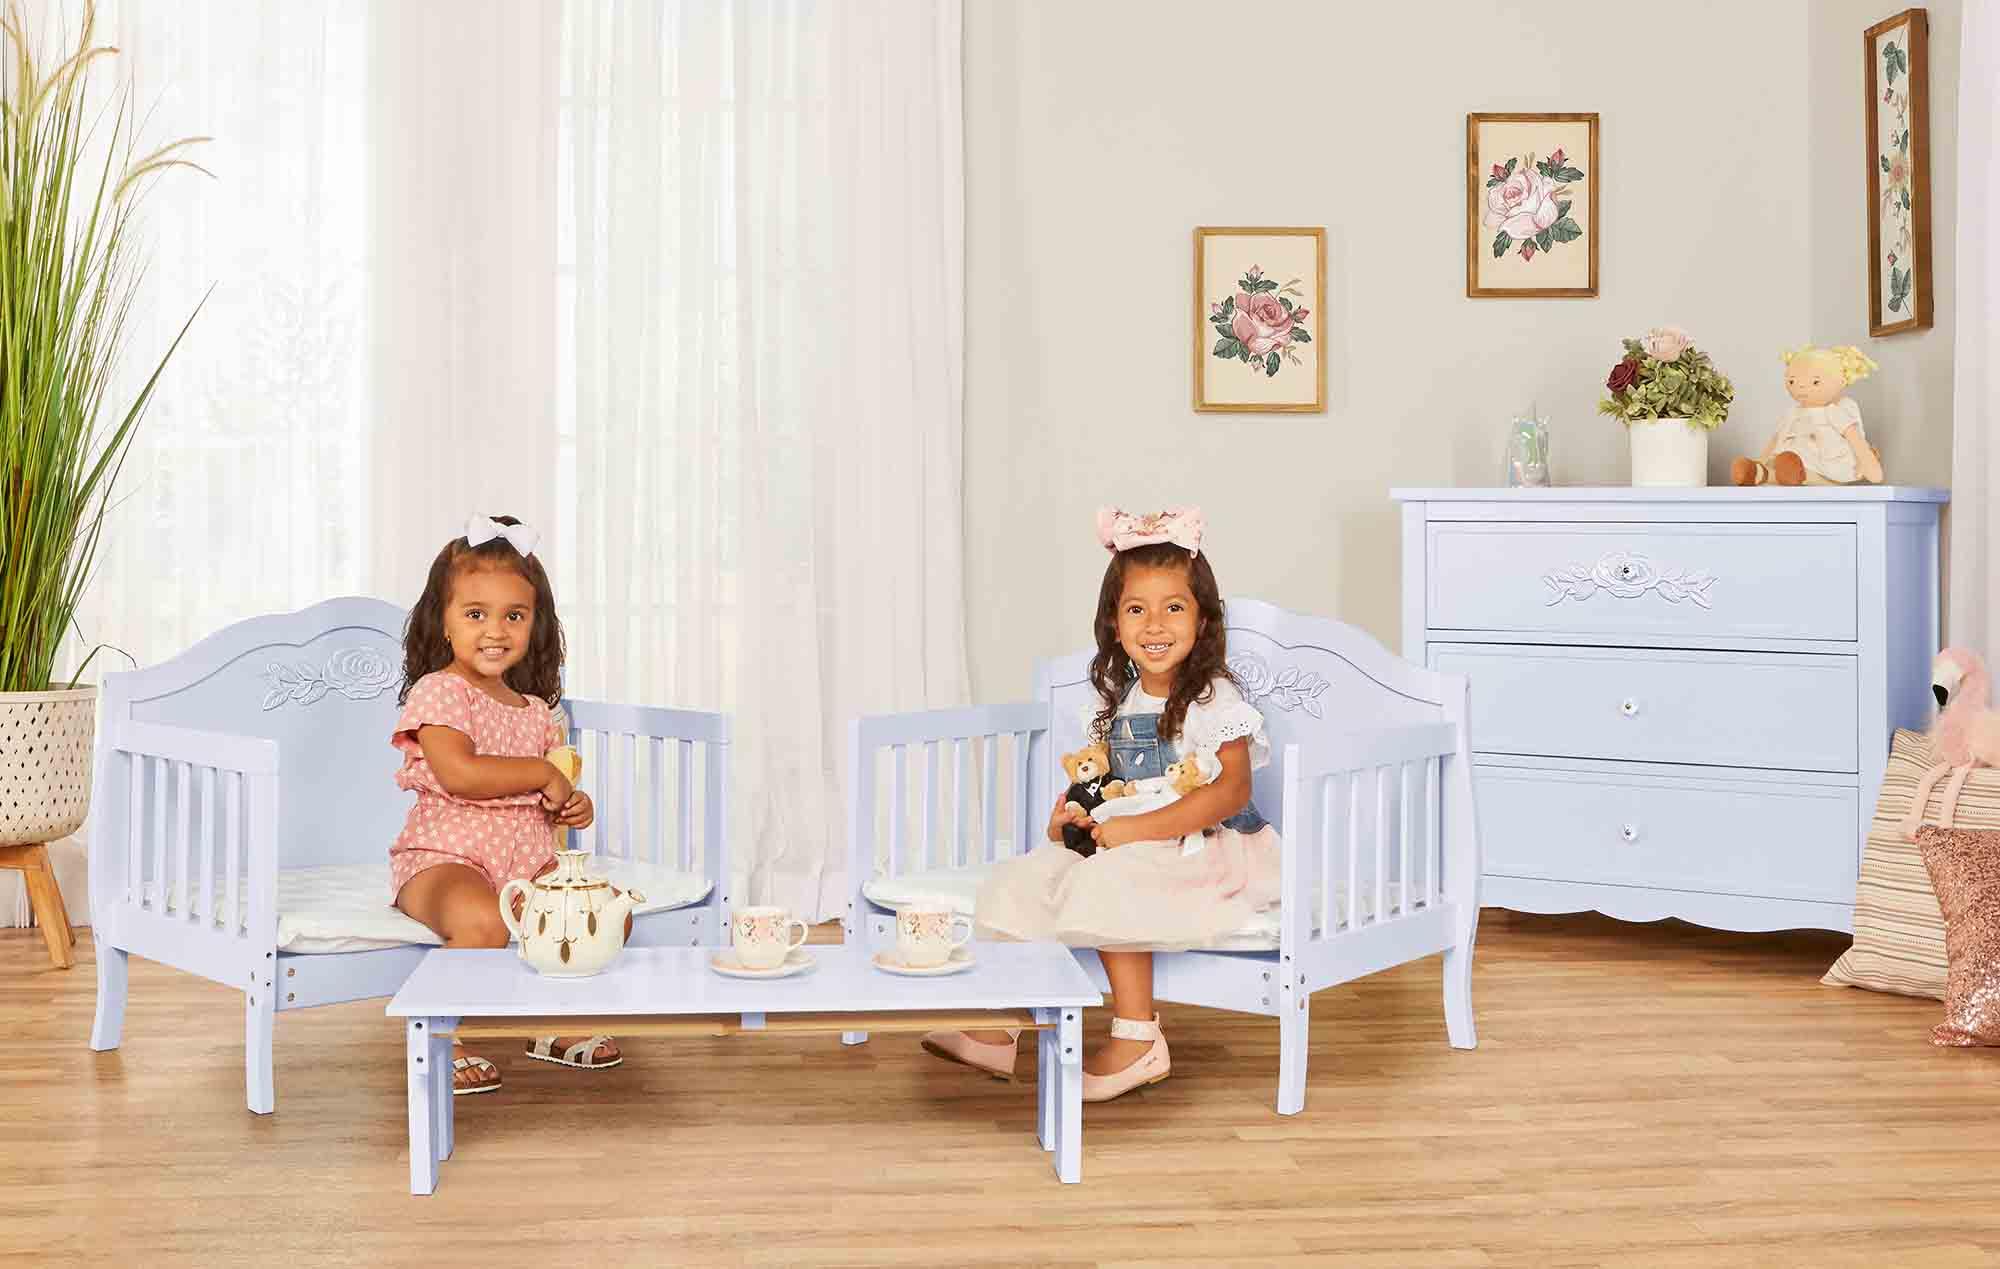 640_LAVD Rose Toddler Bed RmScene 02